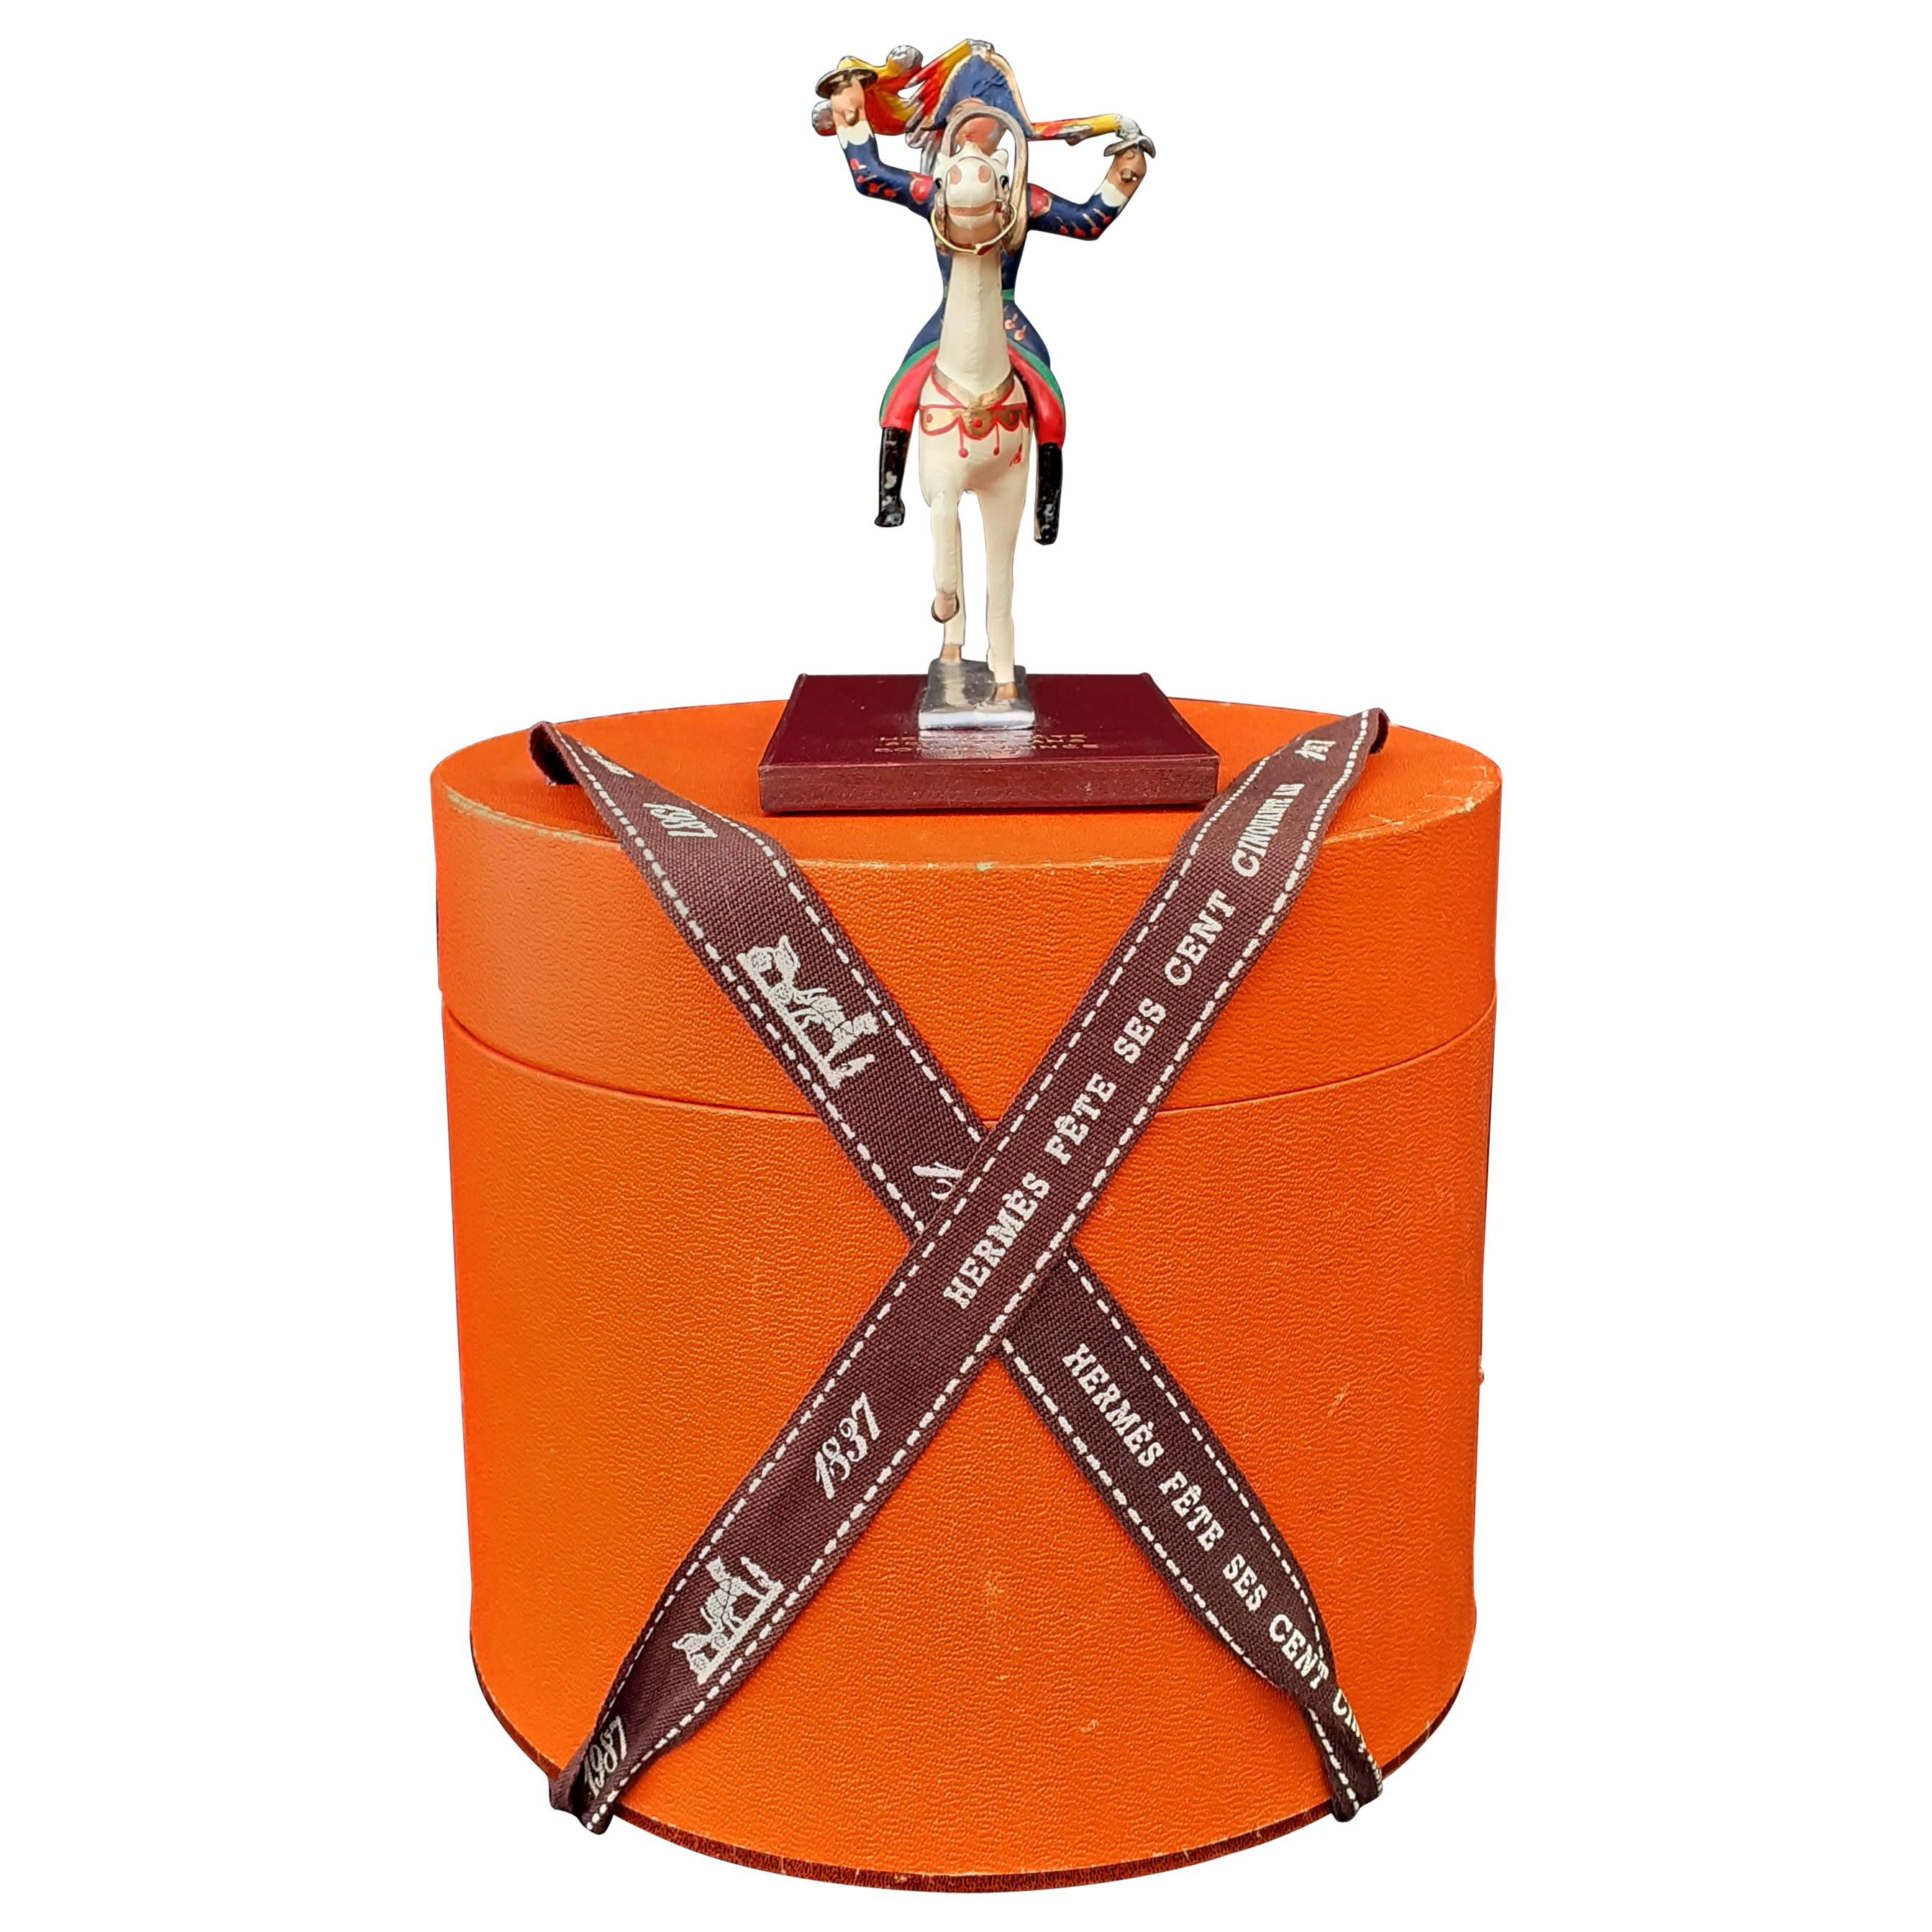 Hermès Hermès celebrates its 150th anniversary Figurine Rider Horse 1837-1987